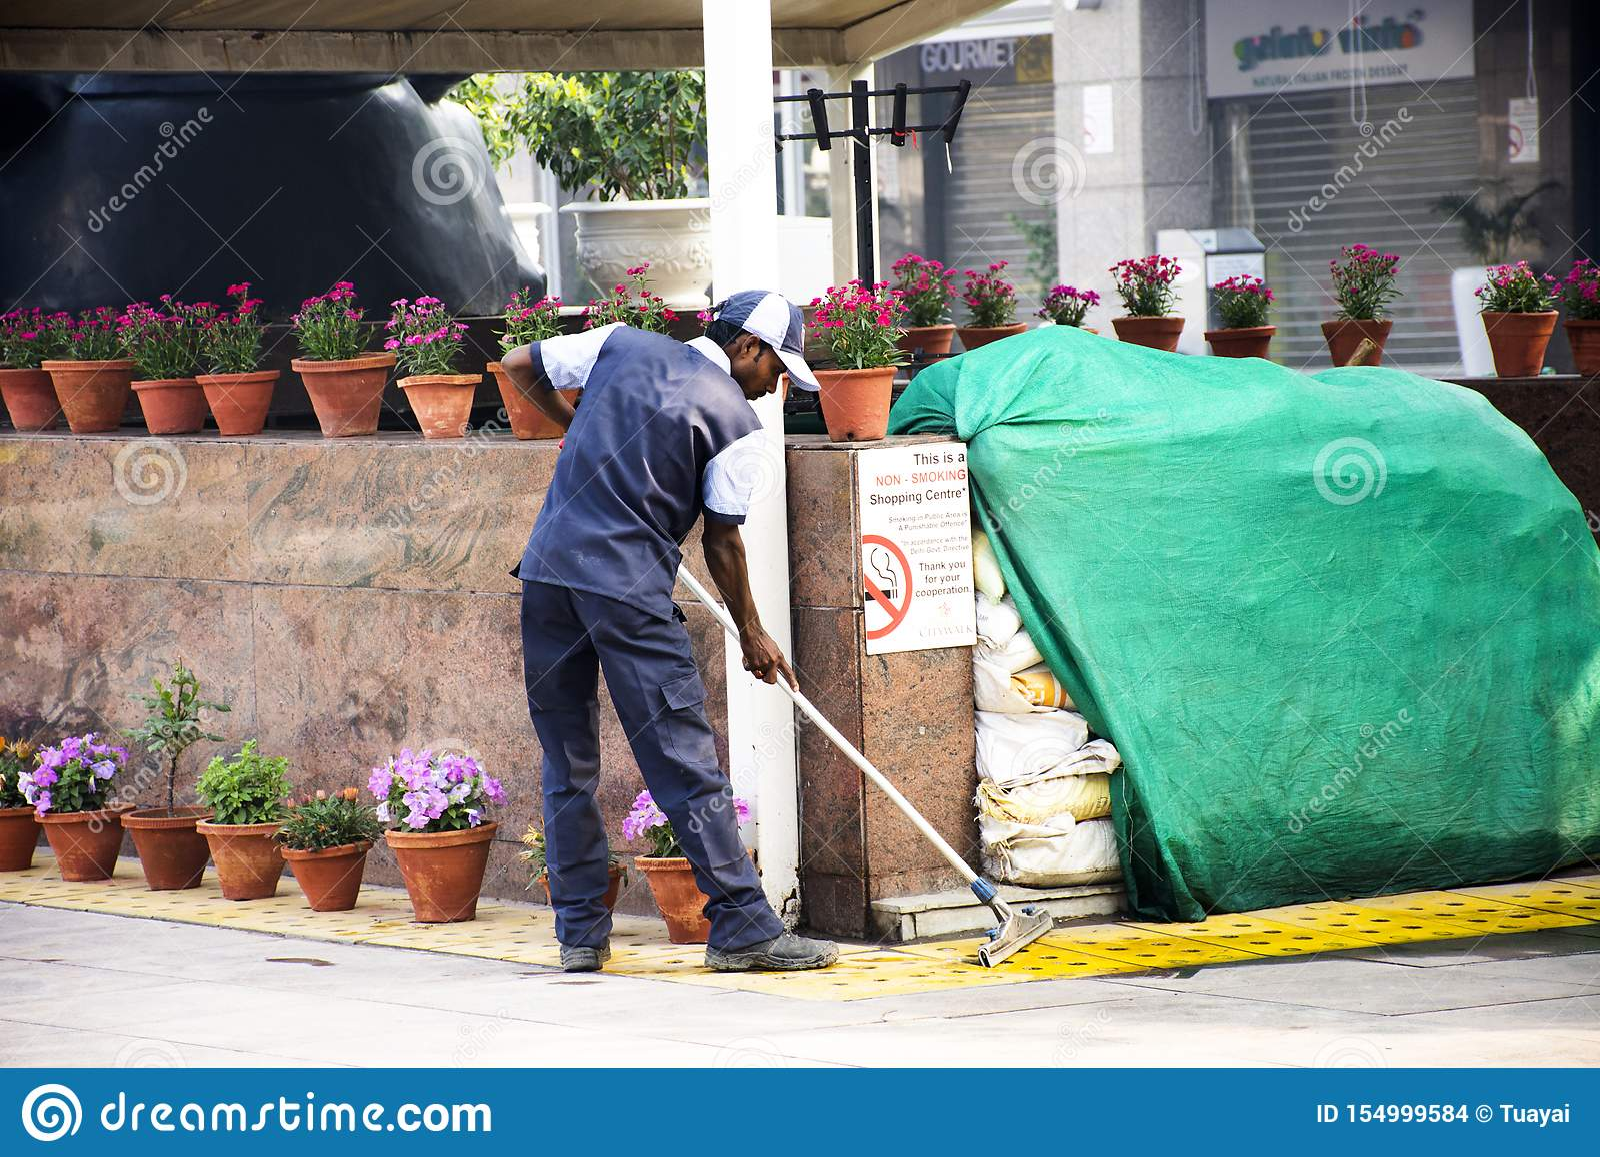 https www dreamstime com indian men worker cleaner cleaning floor patio park garden department store delhi city morning start thai festival image154999584